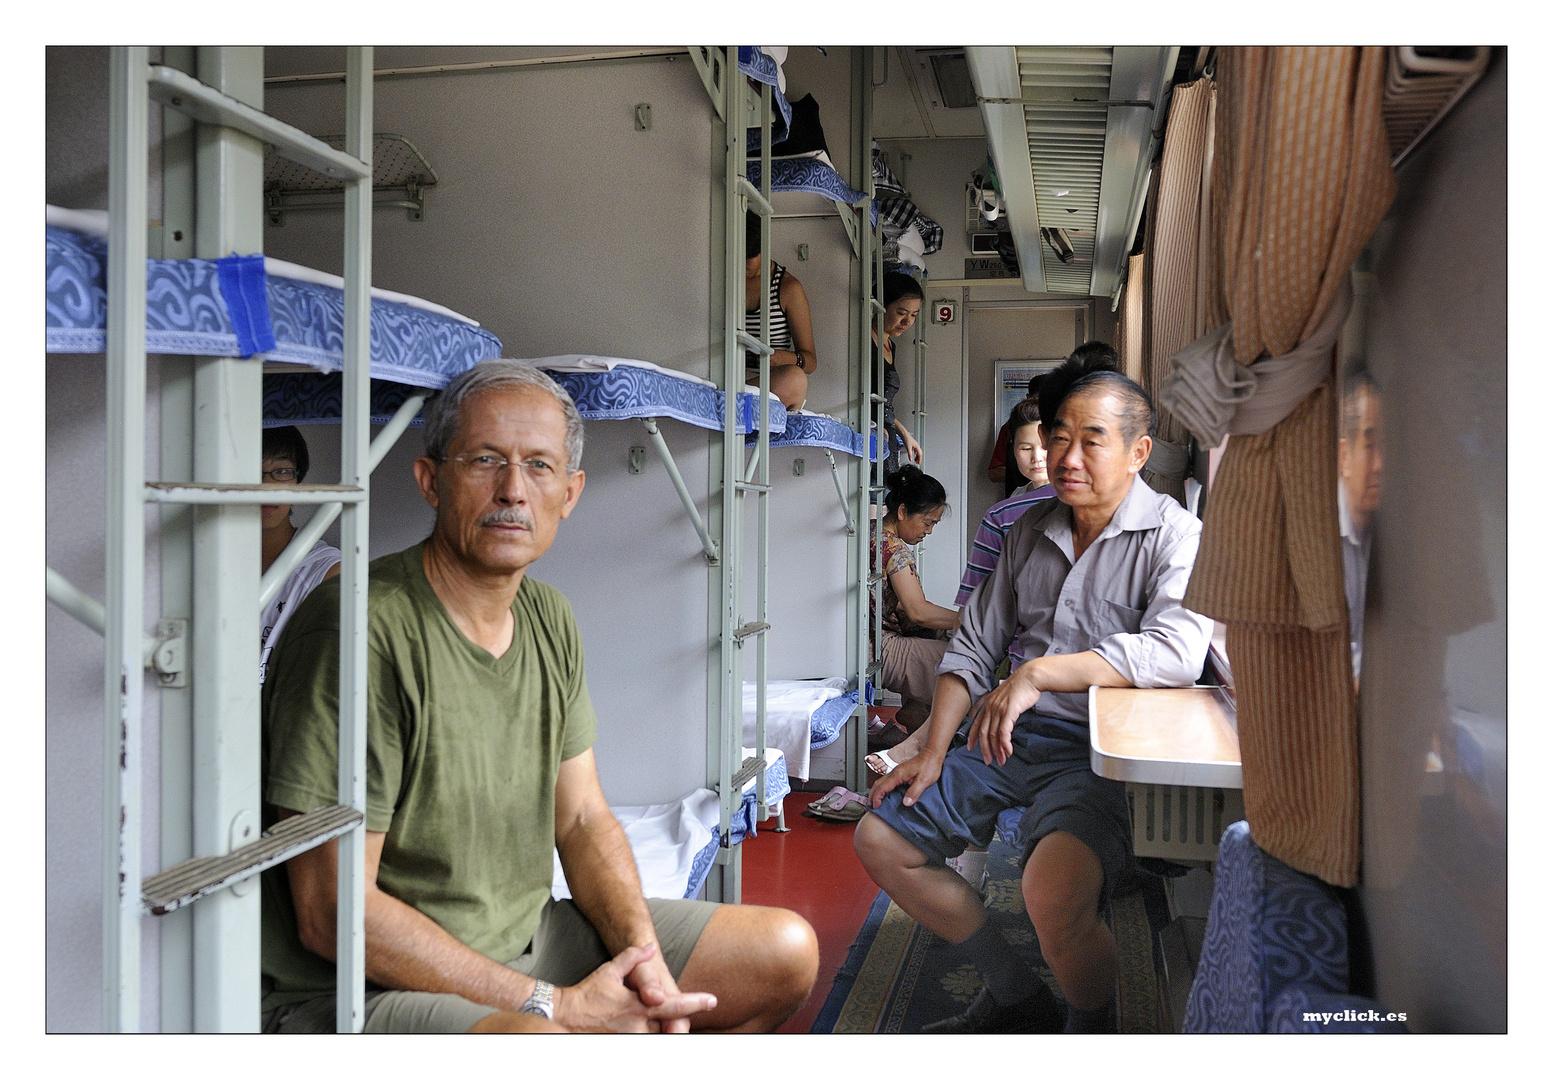 EN LA RUTA DE LA SEDA -VIAJANDO AL LEJANO NORTE -TREN DE LITERAS -TRAYECTO DUNHUANG-TURFAN CHINA